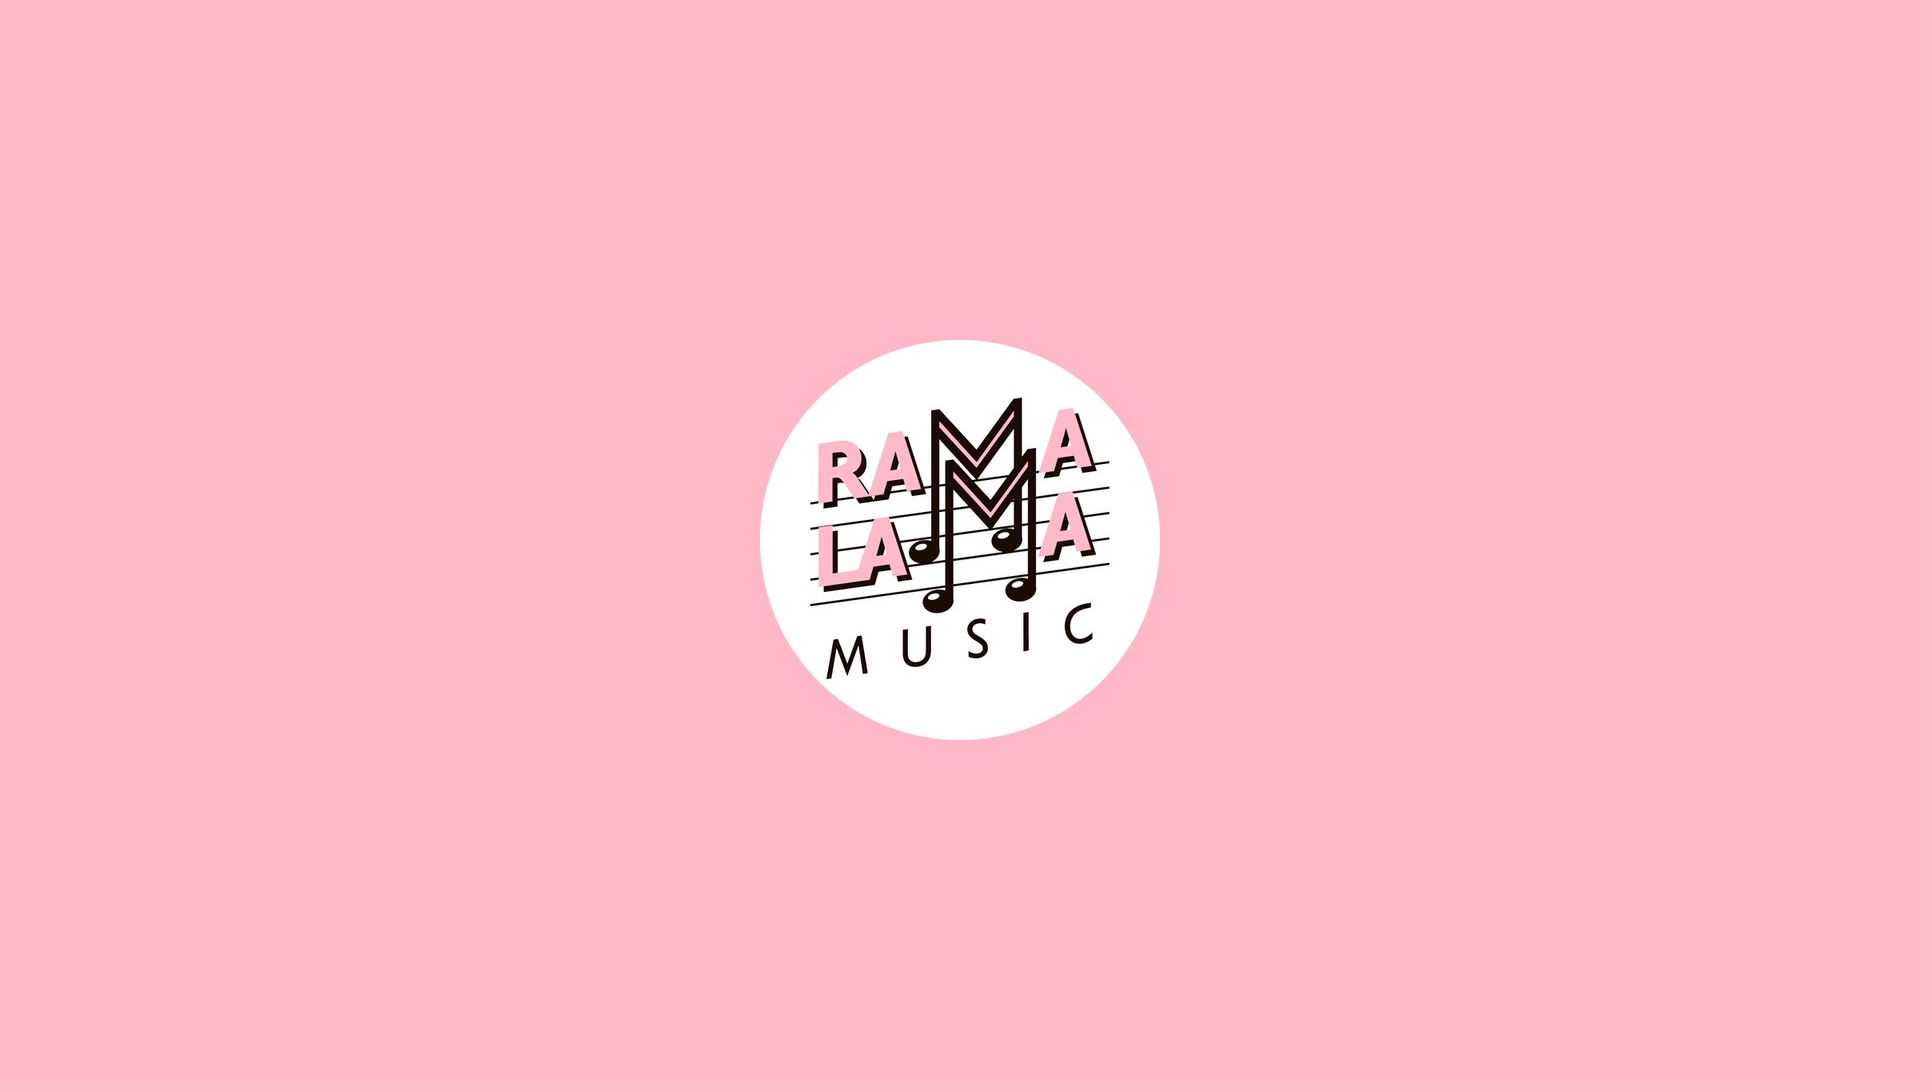 Ramalama Music, web hecha por murciègalo en 2018